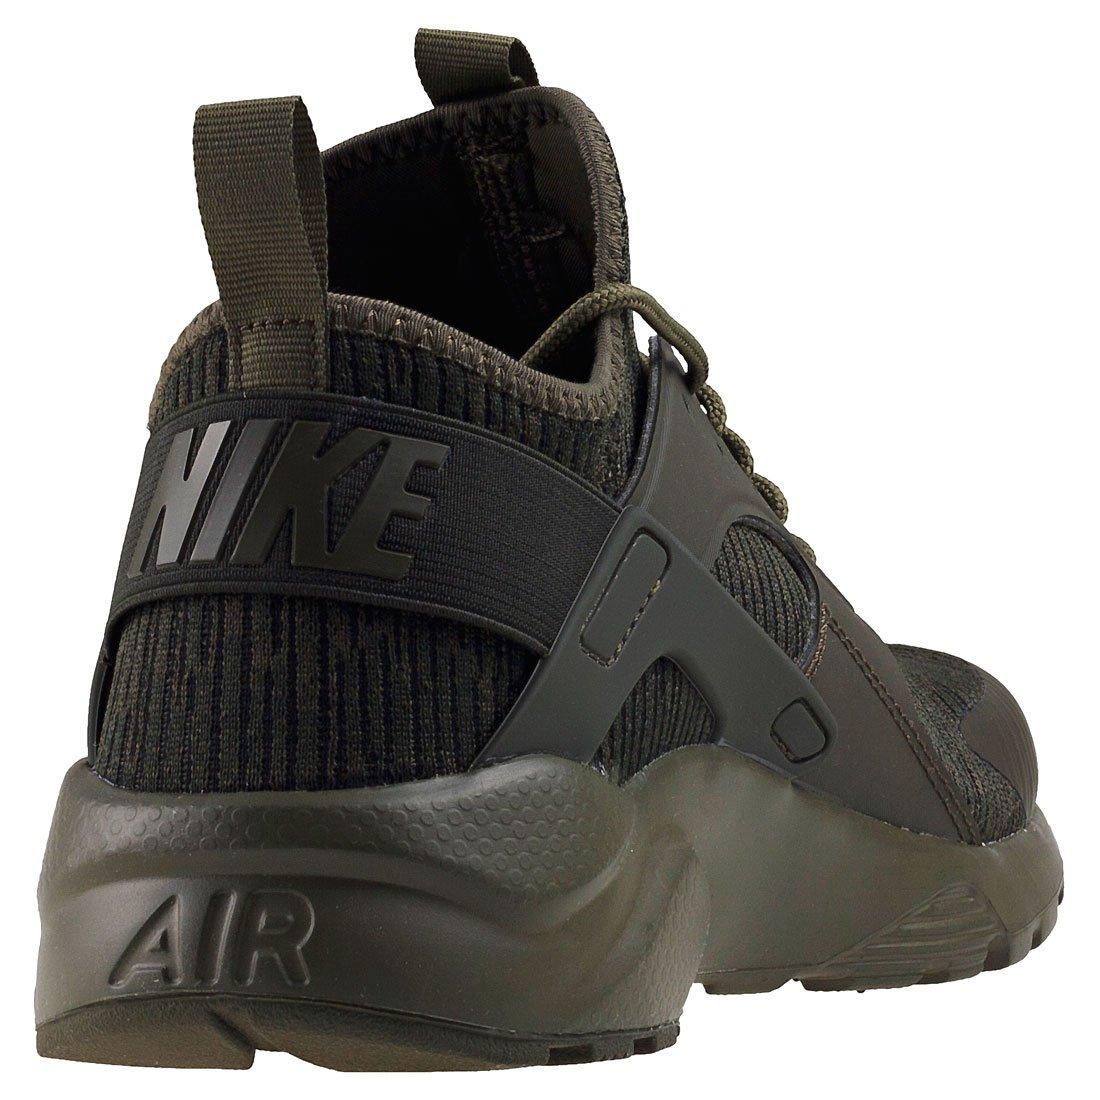 sale retailer b5ef9 51272 Amazon.com   NIKE Air Huarache Run Ultra SE Lifestyle Shoes Cargo Khaki  875841-303 SZ 8.5   Shoes